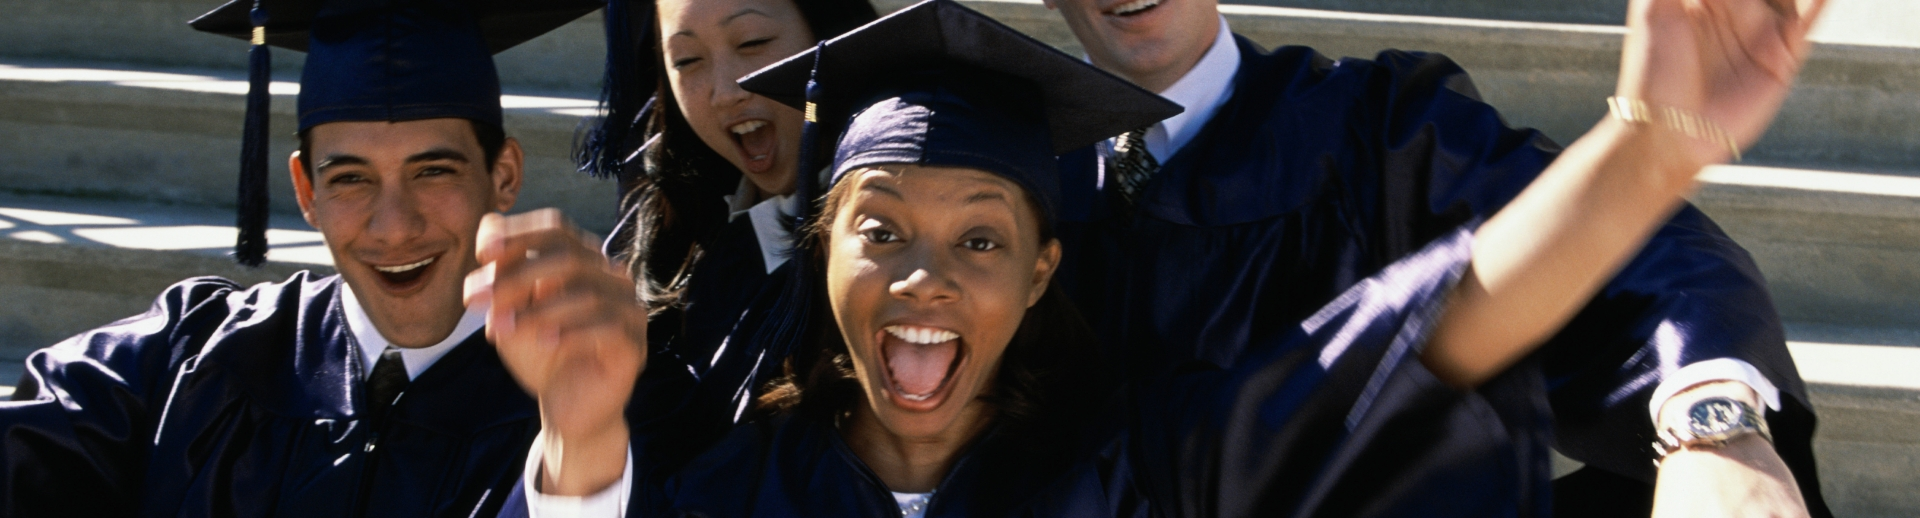 Graduates from school